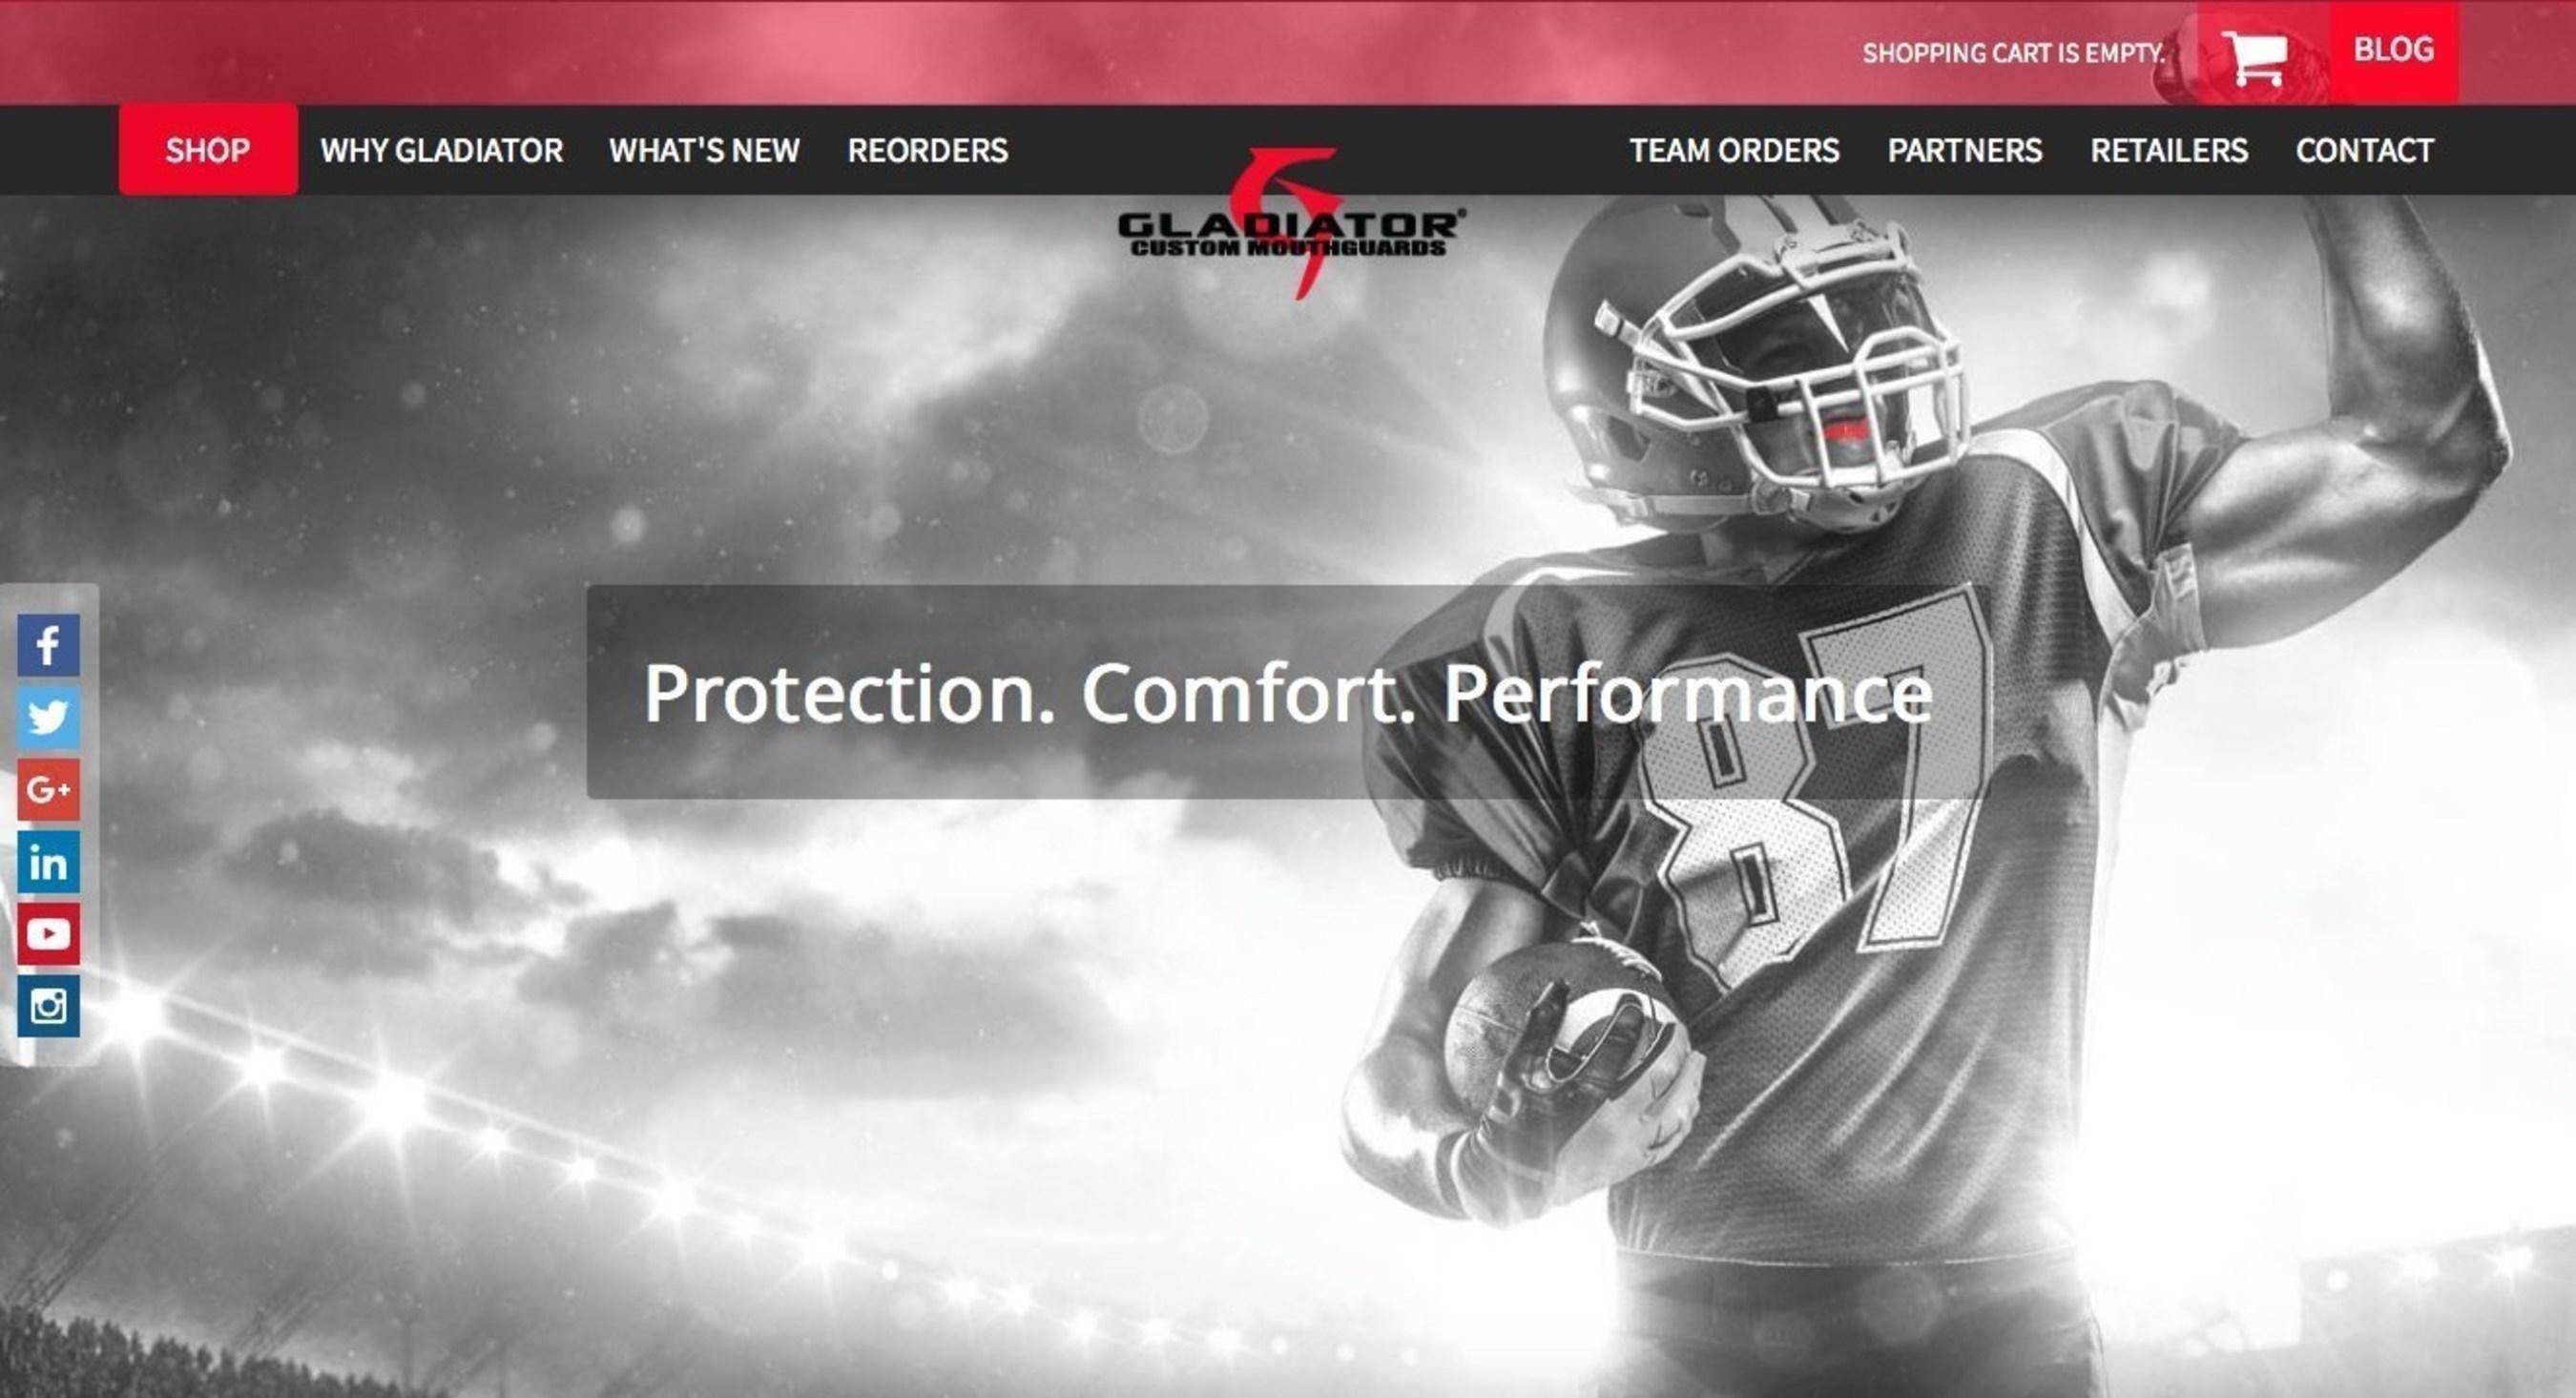 Newly-Designed Website, Same Expertly-Designed Mouthguards